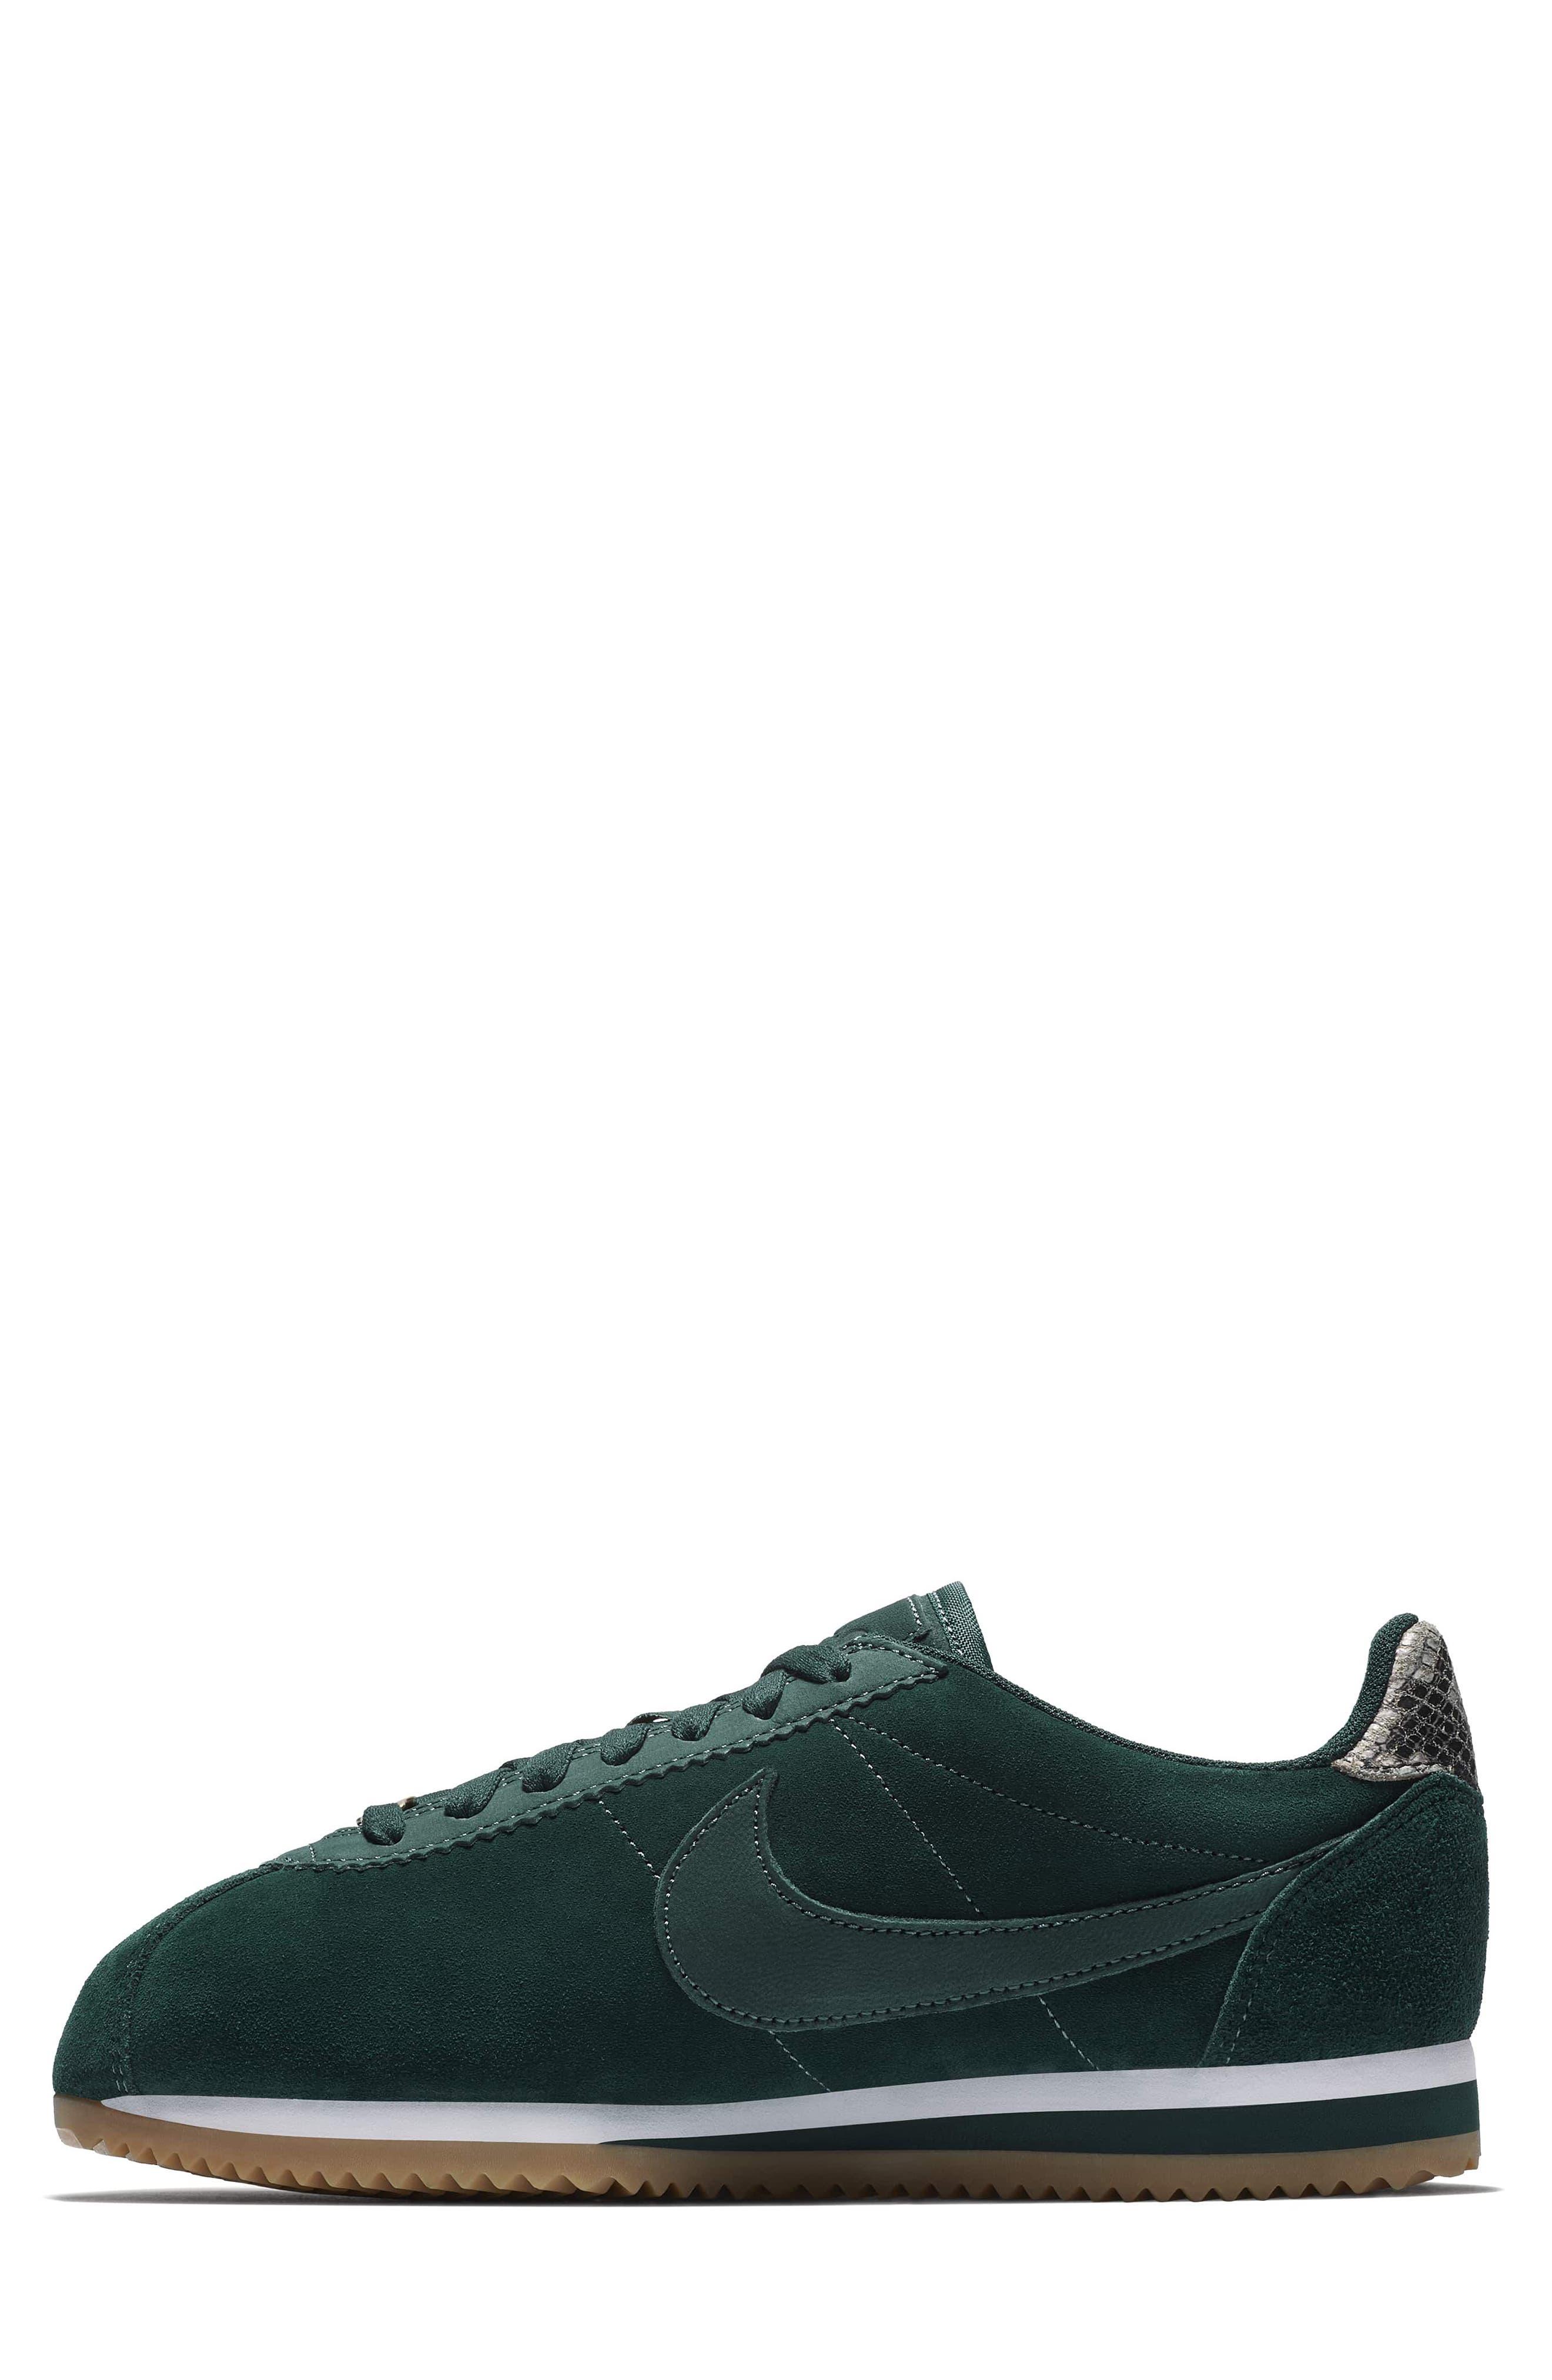 x A.L.C. Classic Cortez Sneaker,                             Alternate thumbnail 3, color,                             Midnight Spruce/ White